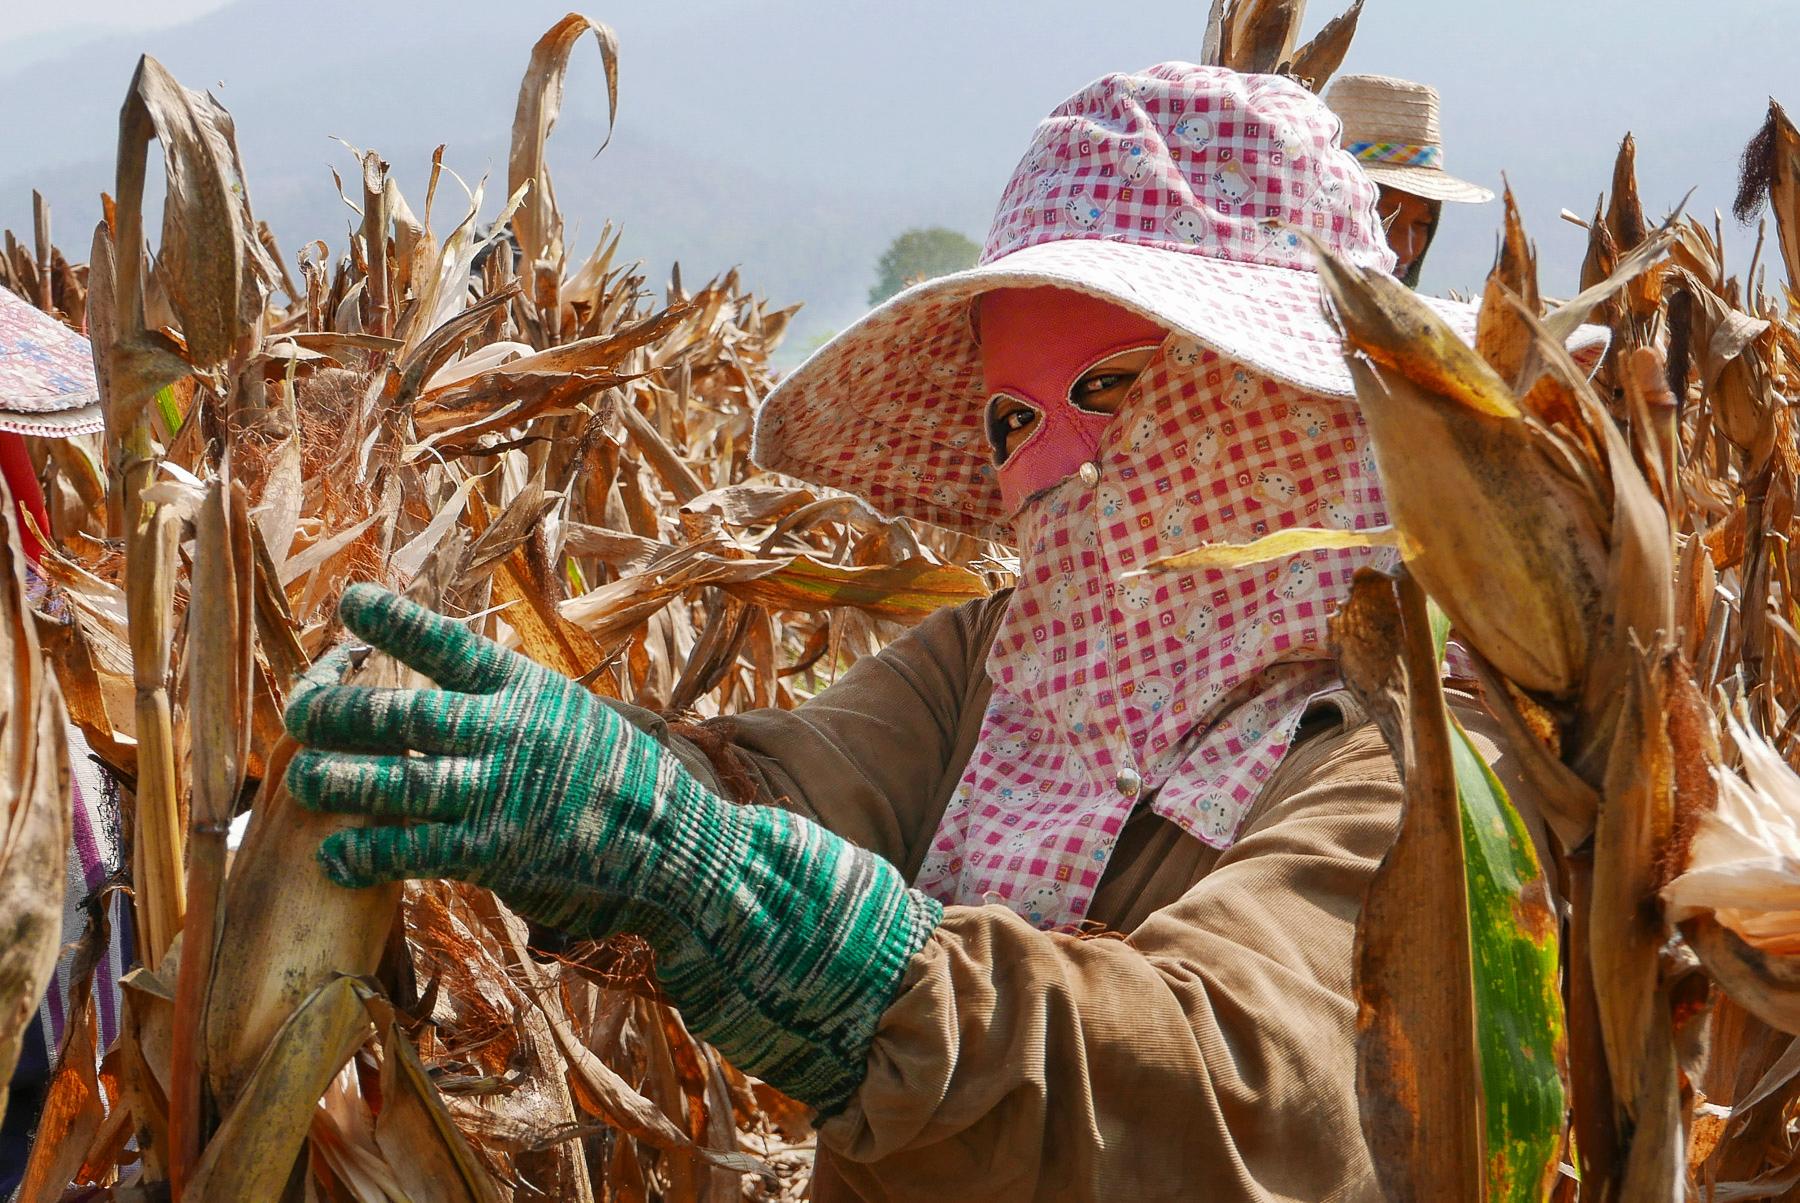 Corn picker, Mae Sariang, Northern Thailand (photo by Irina Stelea)